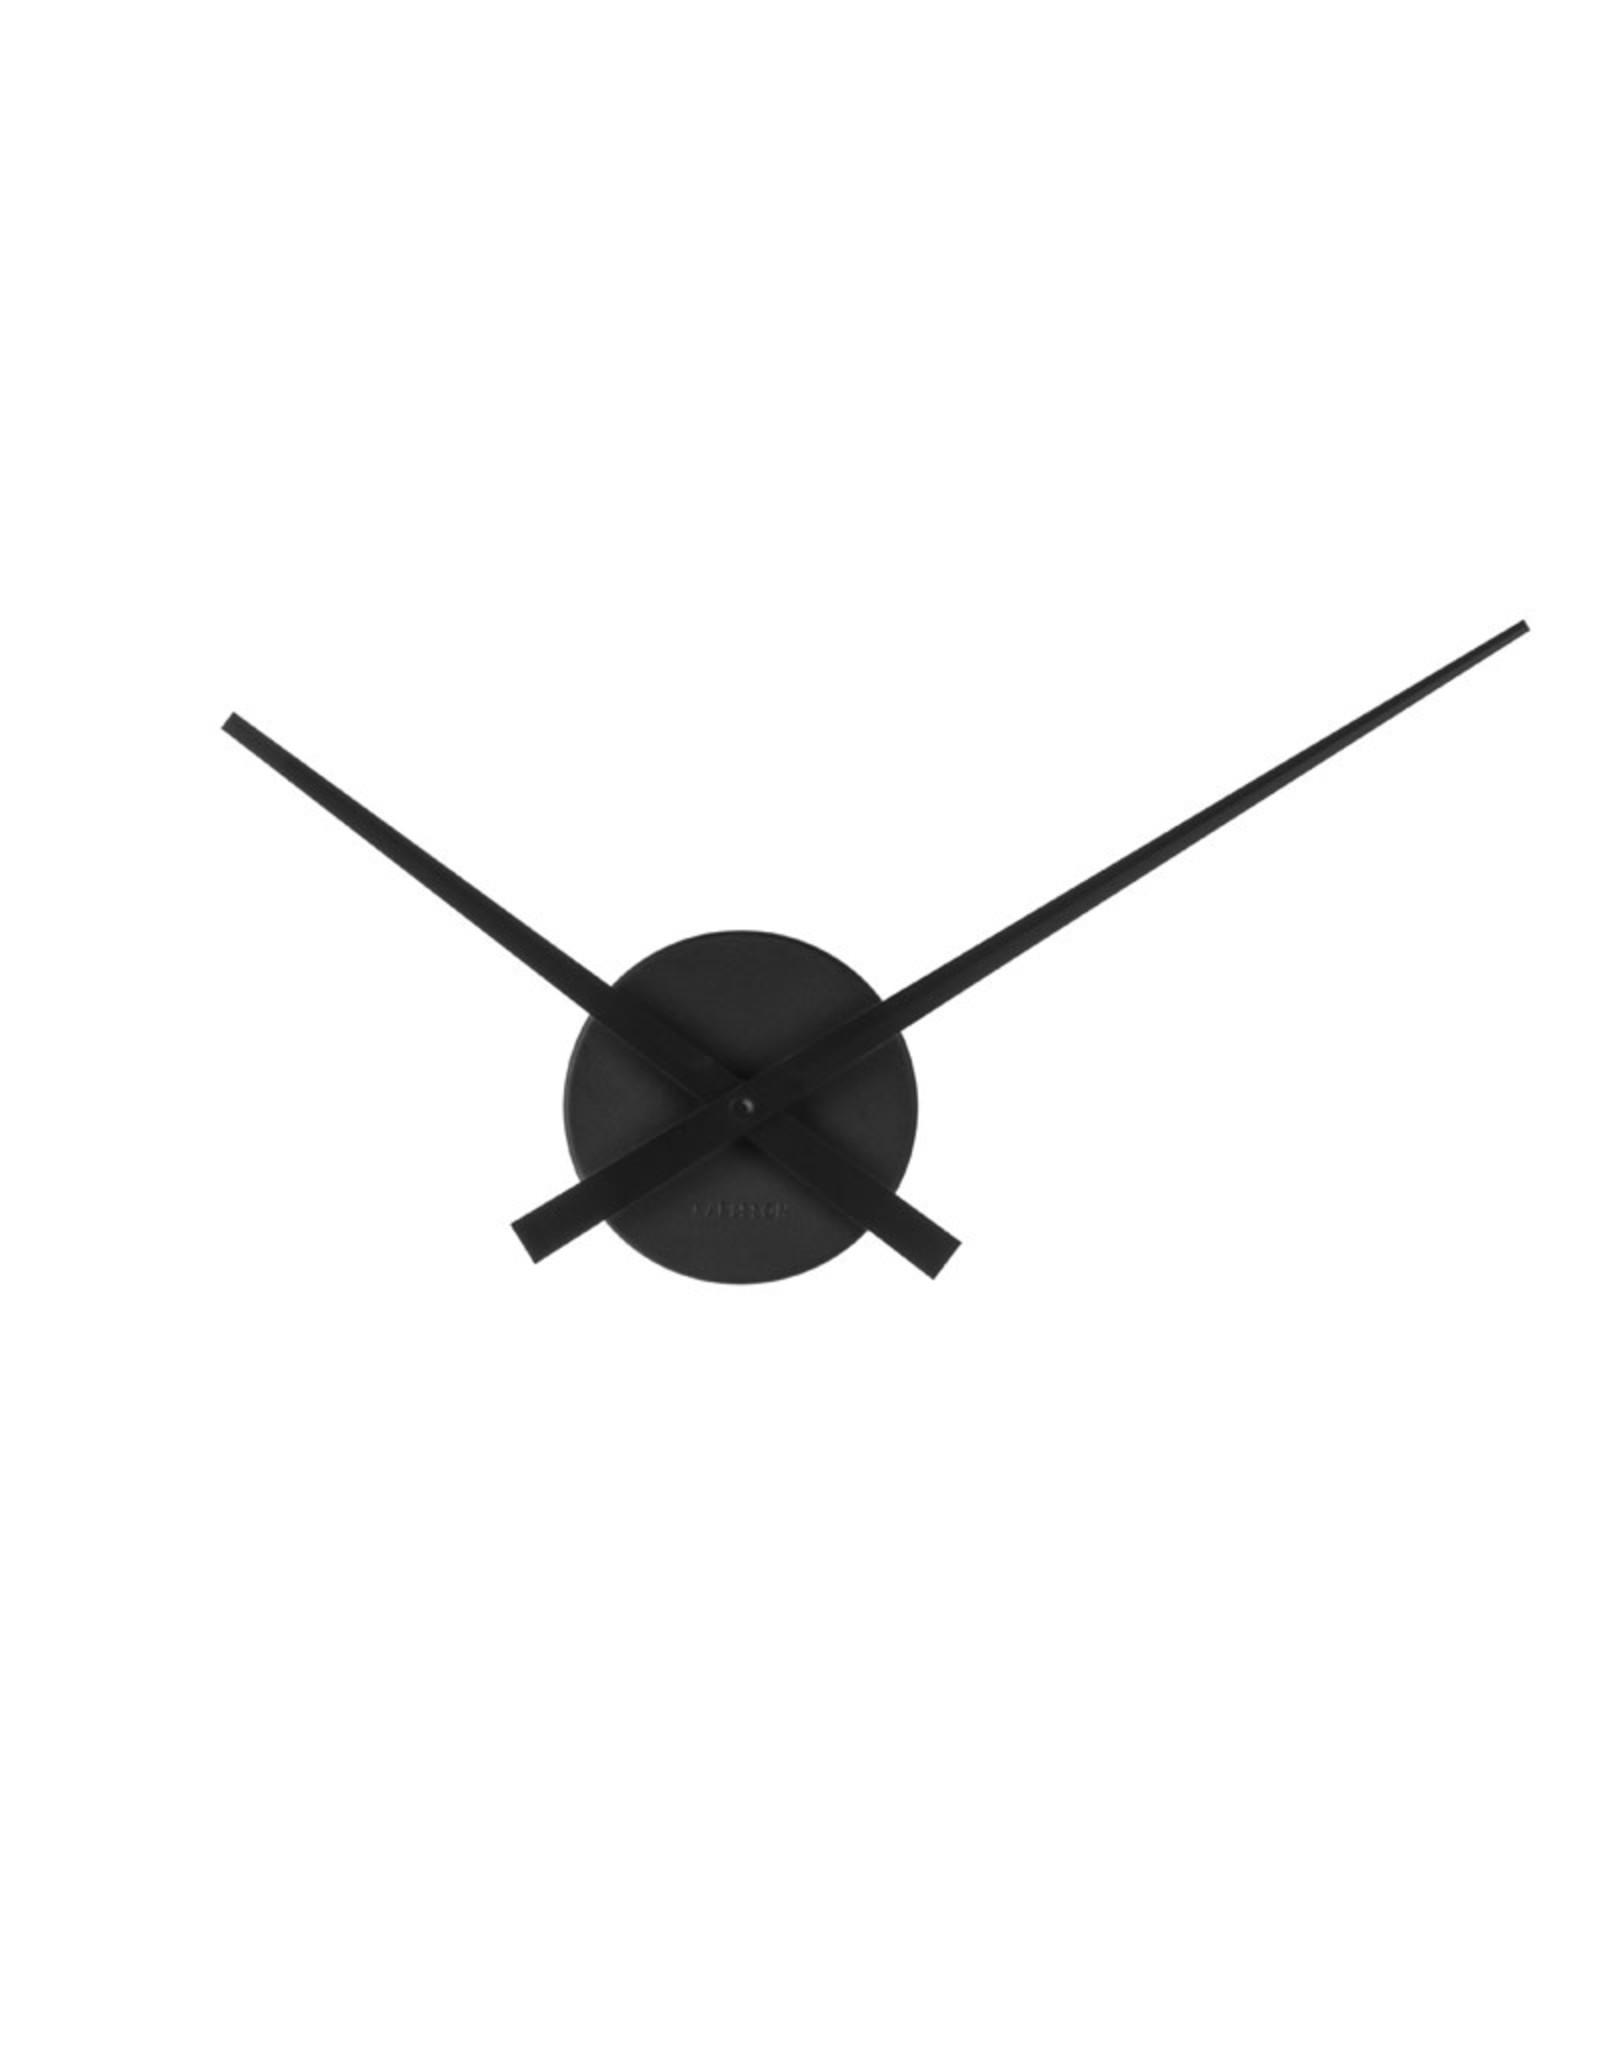 KARLSSON KARLSSON LITTLE BIG TIME WALL CLOCK